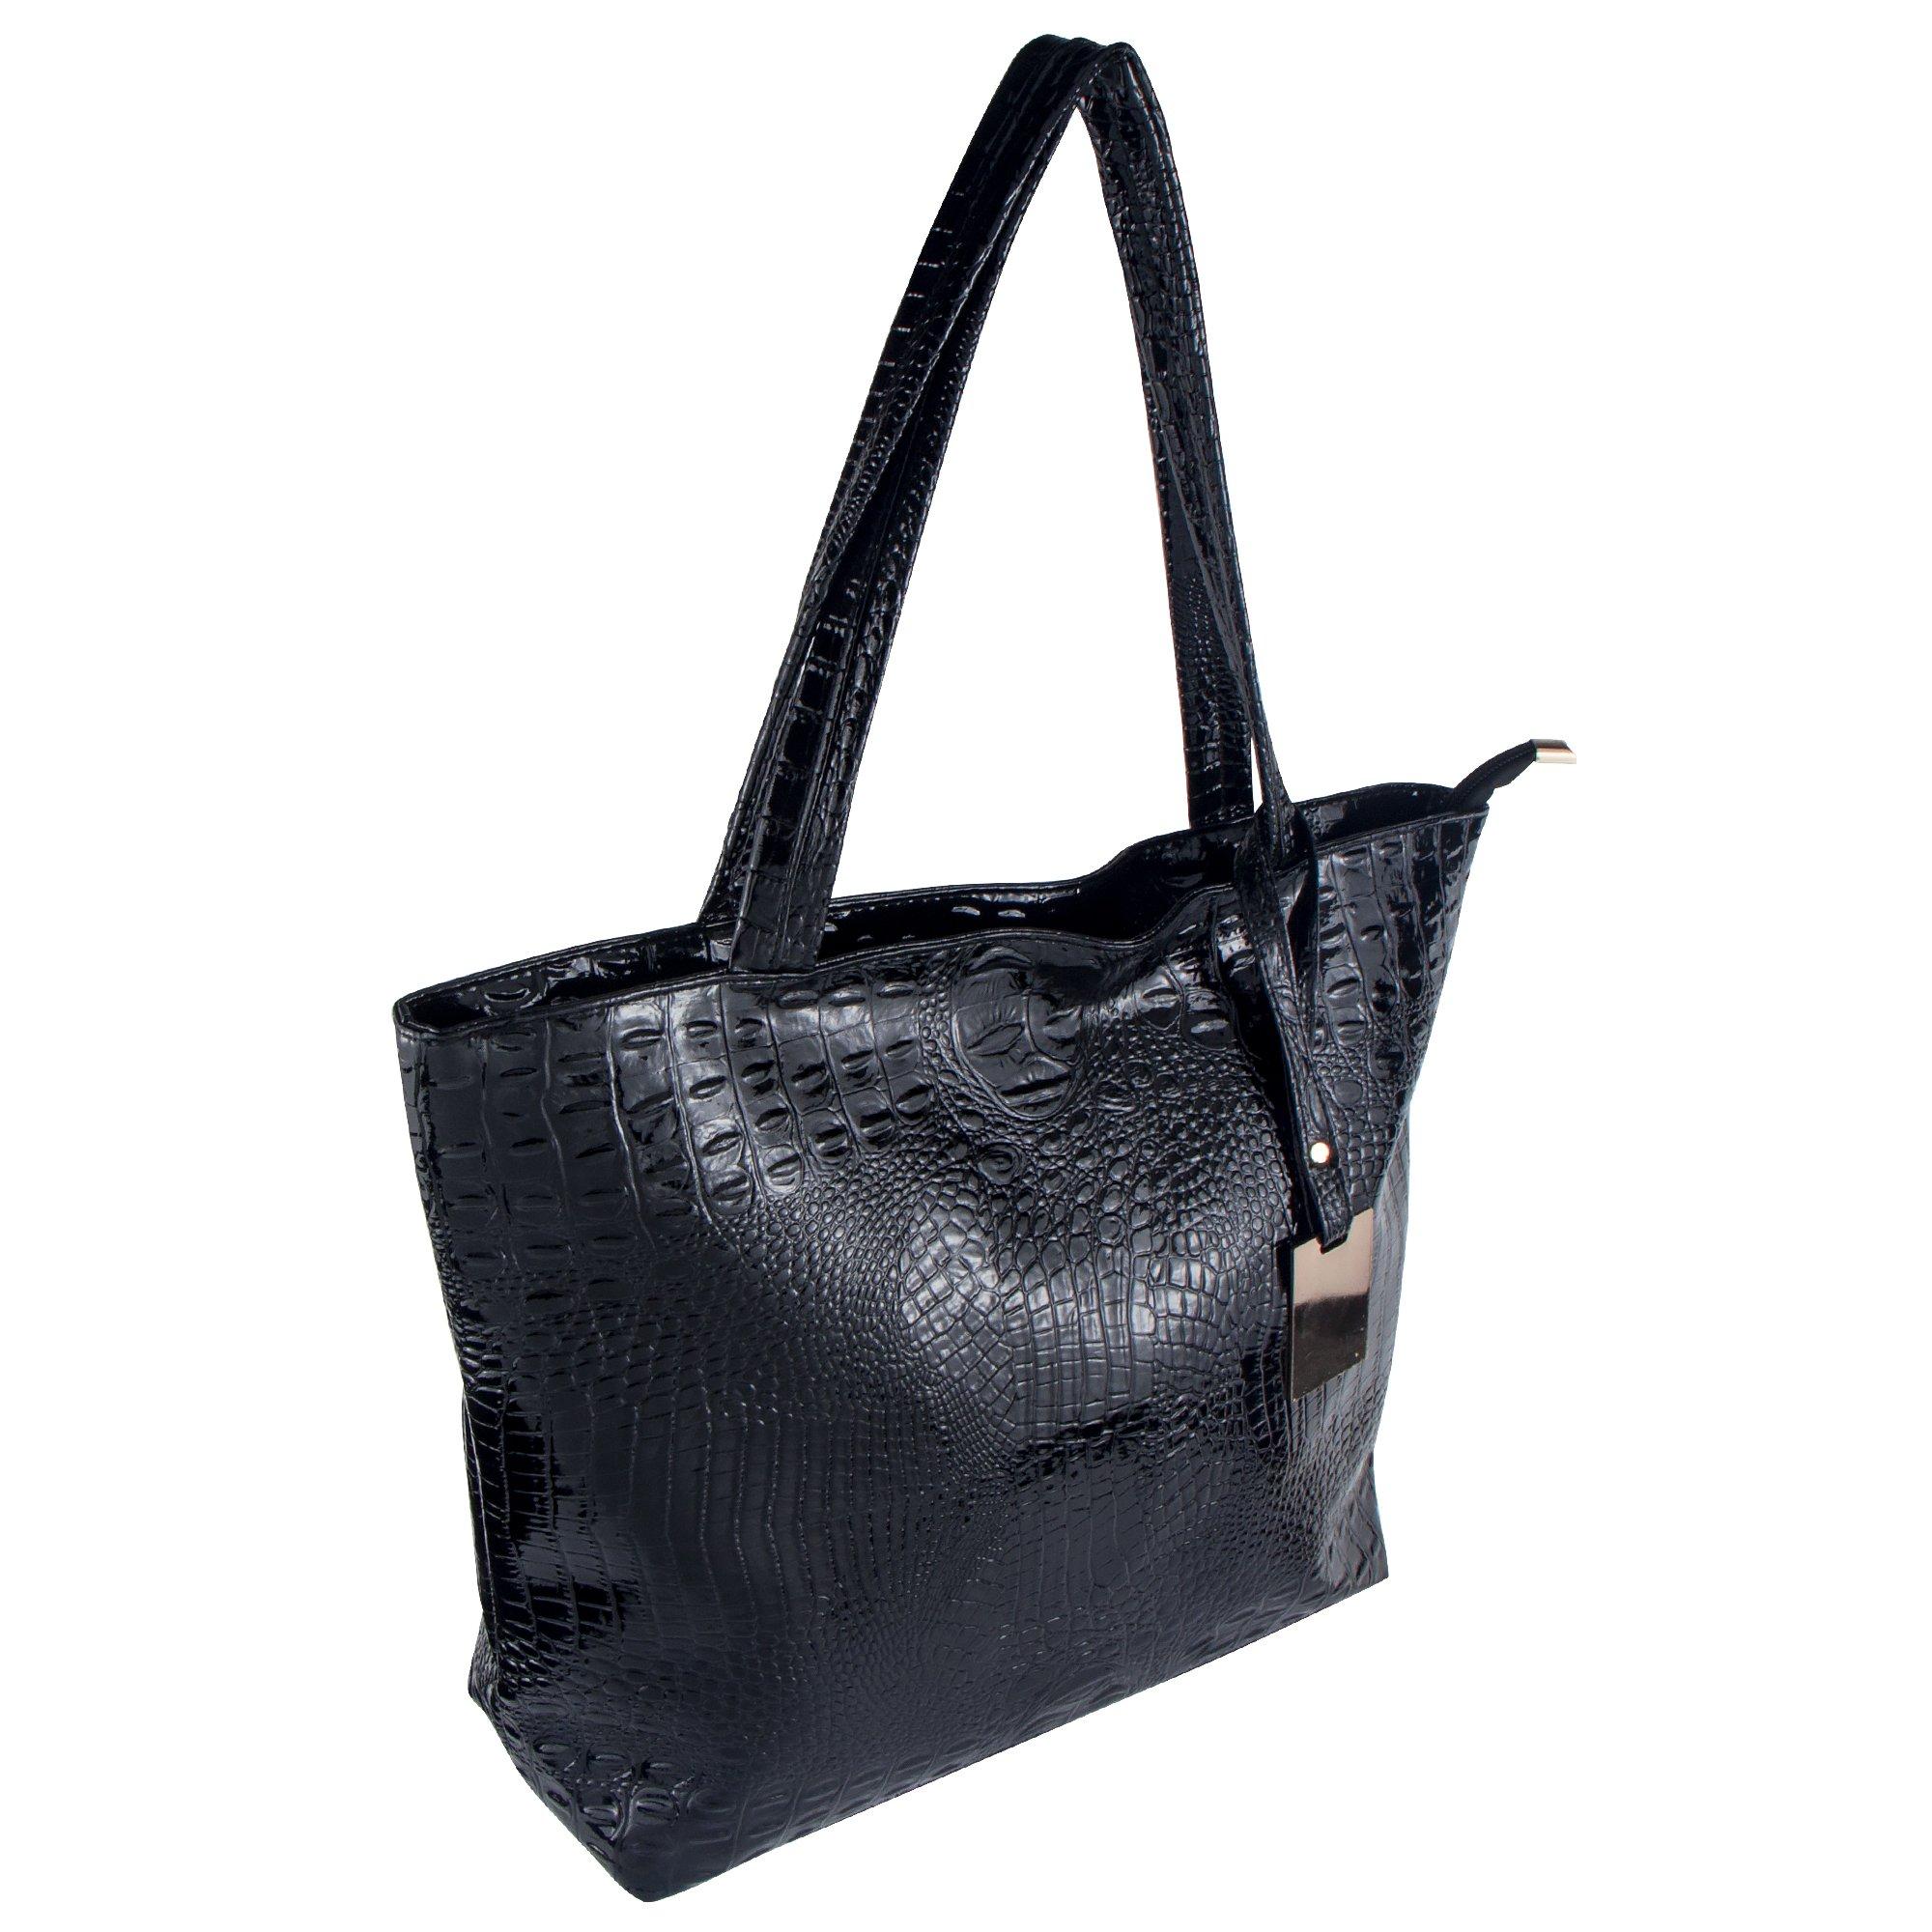 Bagood Womens Crocodile Pattern PU Leather Casual Shopping Handbags High Capacity Shoulder Ladies Soft Bag for Wedding Bridal Prom Party Black by Bagood (Image #7)